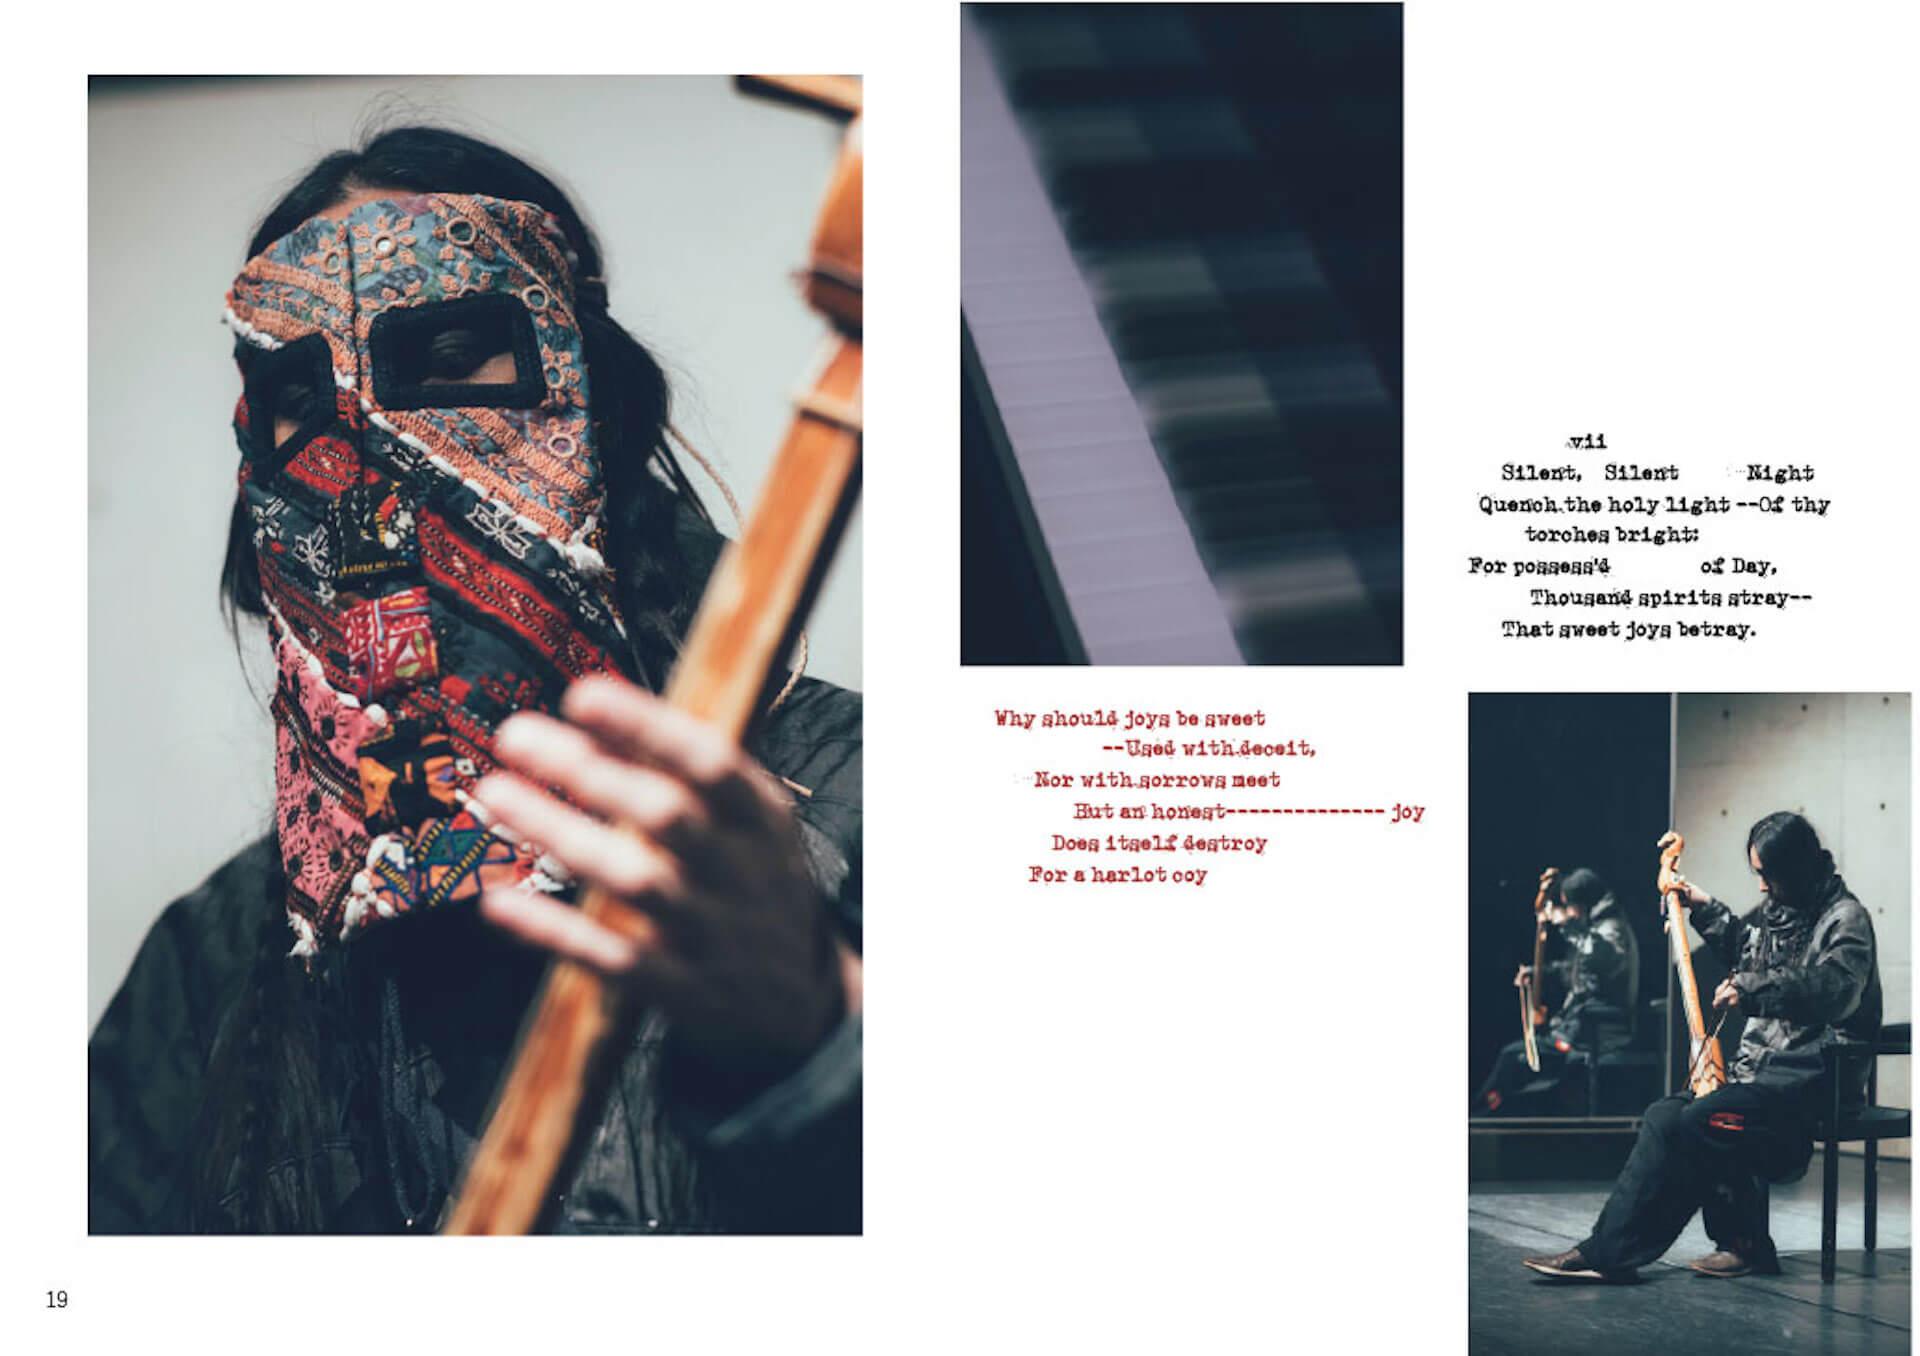 Lehの2020年秋冬コレクションがリリース|イメージモデルに山川冬樹、shimizu mash、elena midoriを起用。コレクションの撮影は水谷太郎。 life_fashion200913-leh-romantic-5